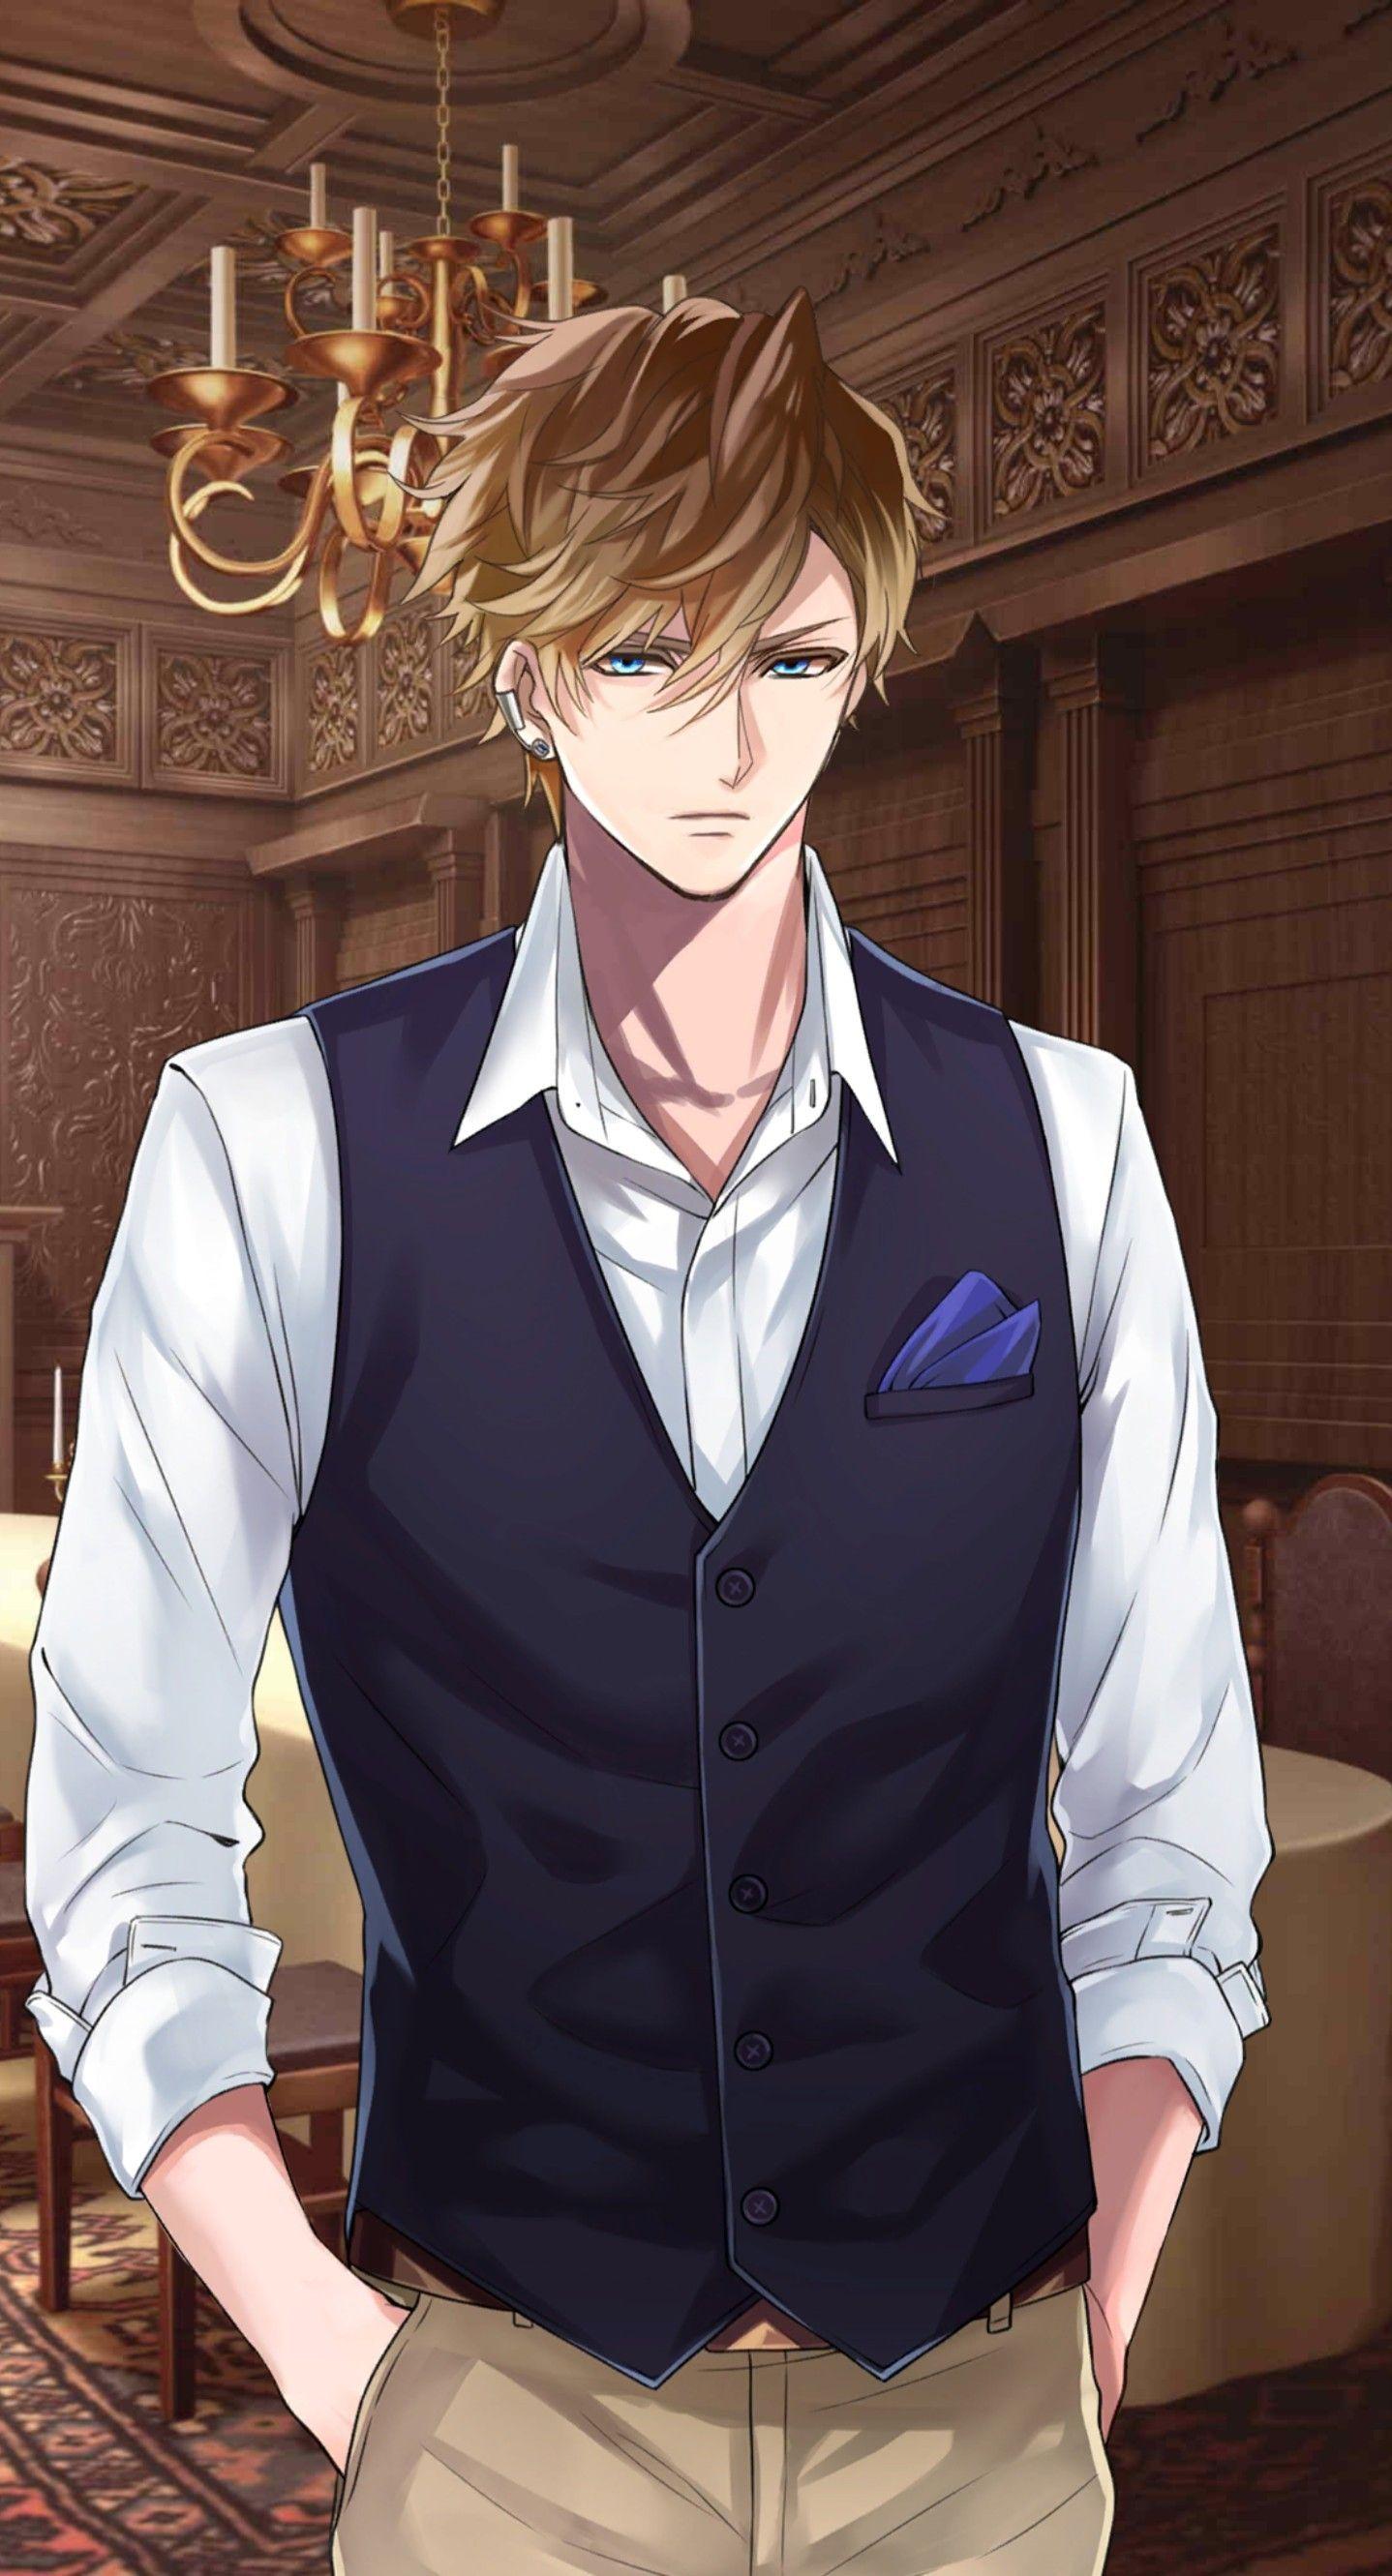 Pin by sulis tia on Ikemen Vampire Anime boy, Anime guys